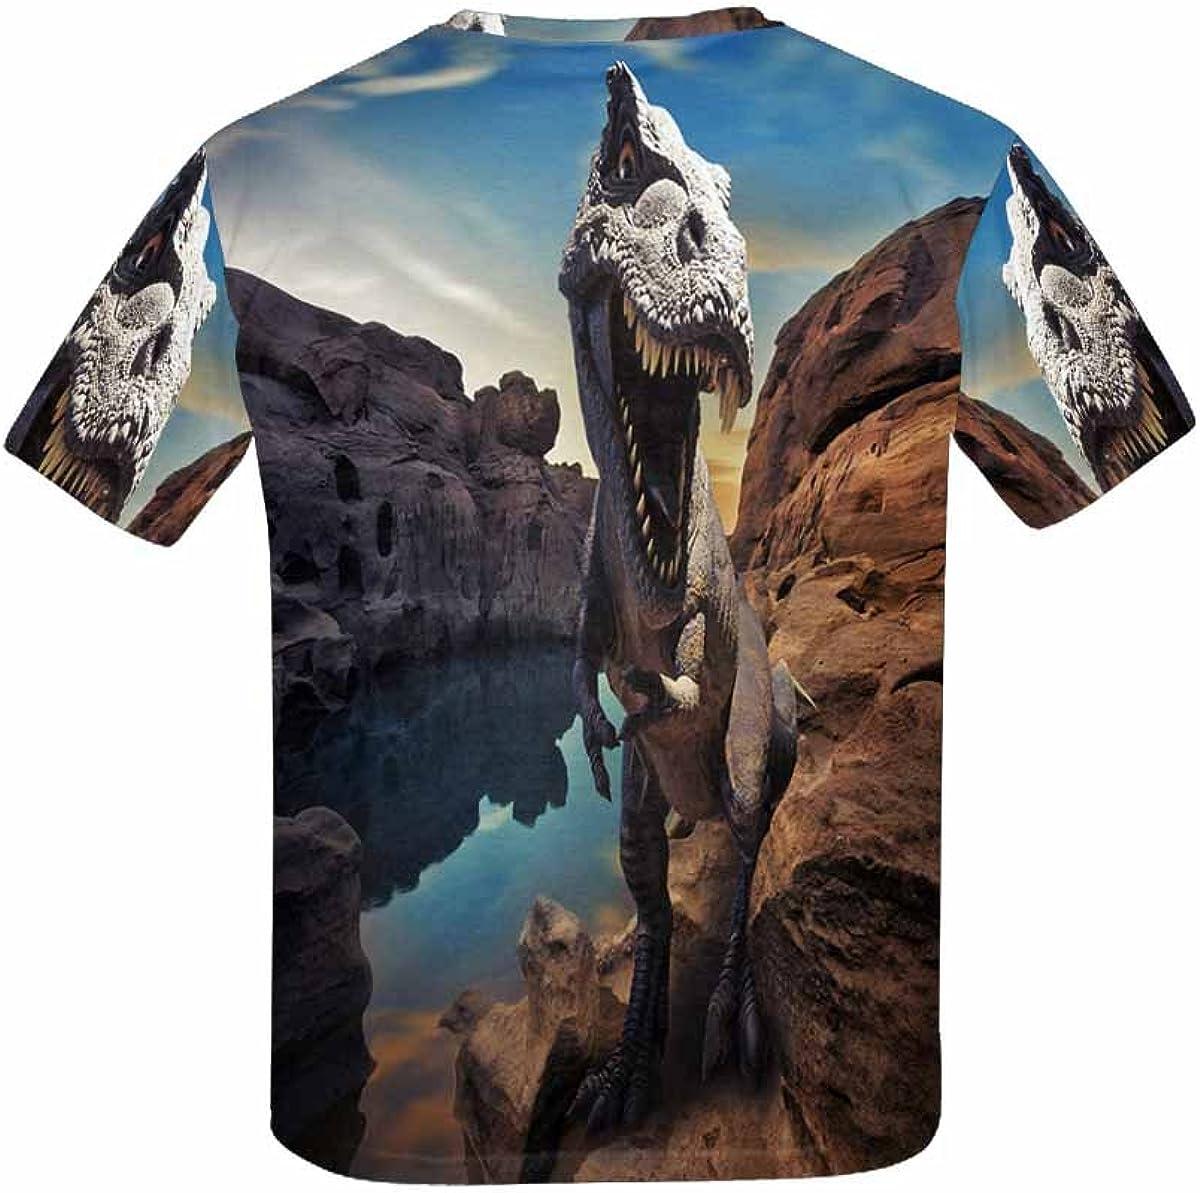 XS-XL INTERESTPRINT Dinosaurs on Mountain Rock Unisex Kids T-Shirts